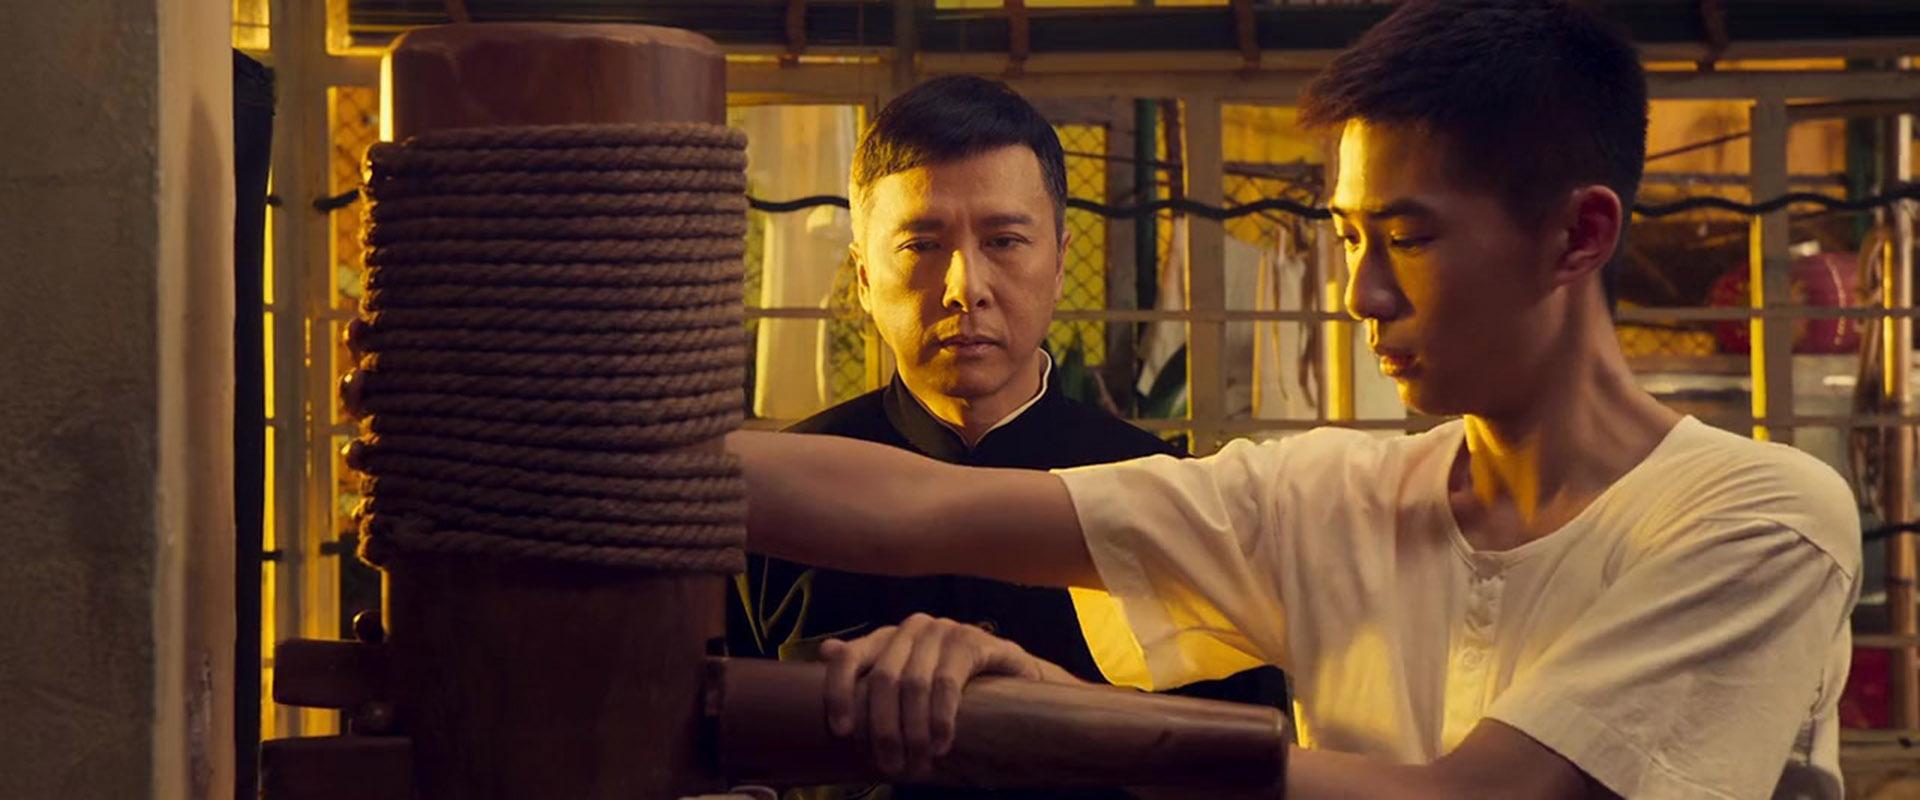 Ip Man 4: Final | 2020 | BDRip | XviD | Türkçe Dublaj | 4K - 1080p - m720p - m1080p | BluRay | Dual | TR-EN | Tek Link